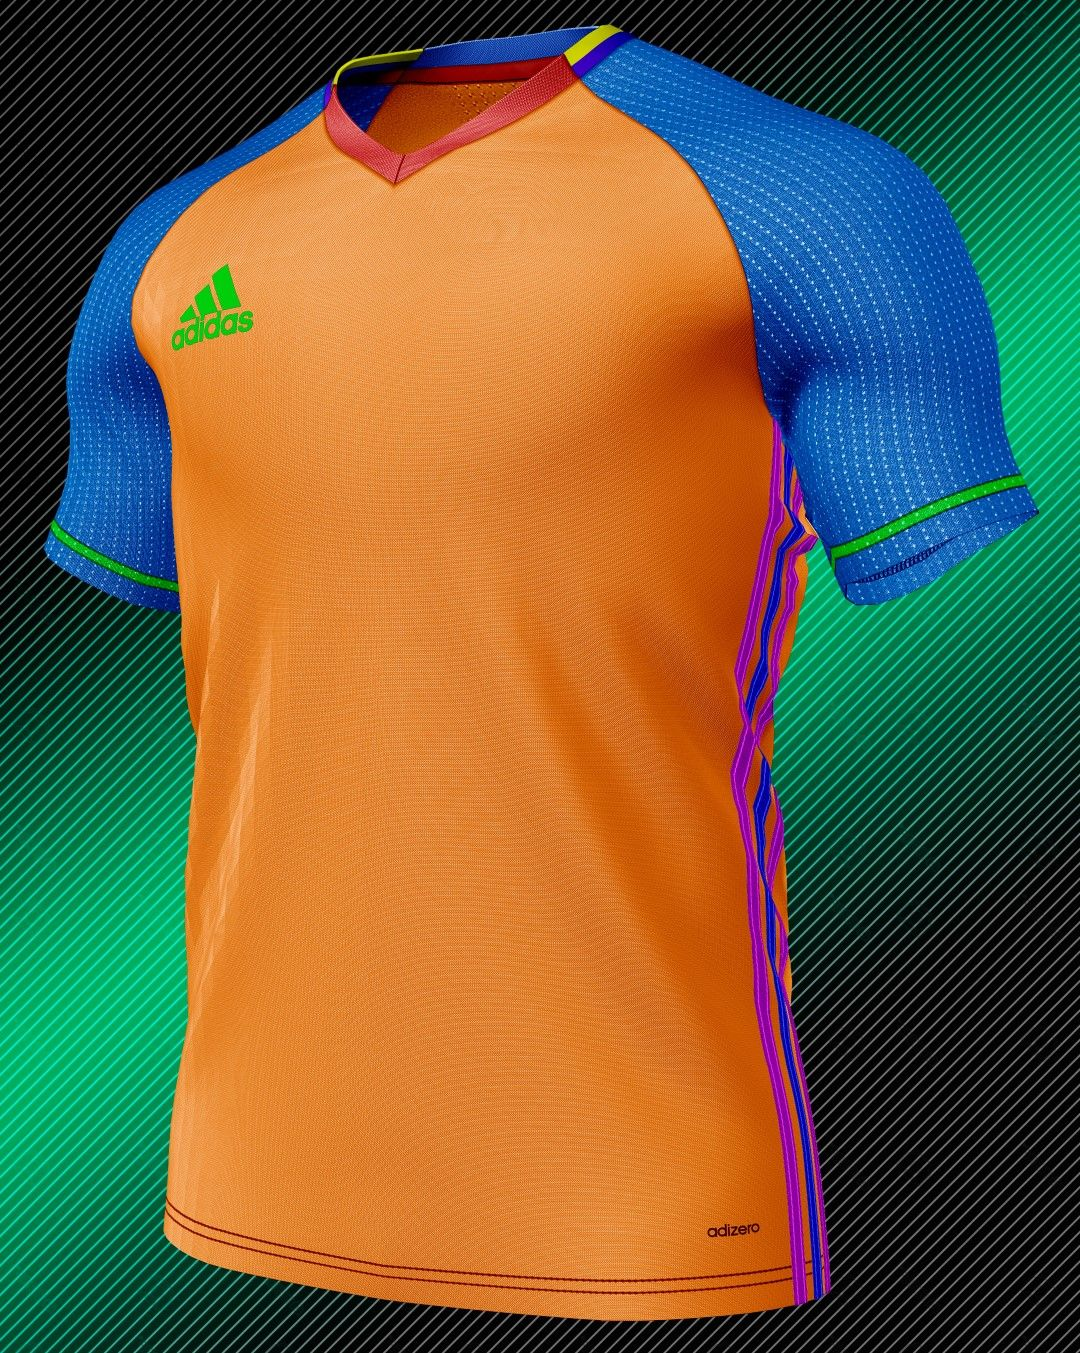 purchase cheap fae54 0ab7f TEMPLATE CAMISETA ADIDAS    DESCARGA GRATIS    HD   Casakero    Templates    Mockups    Futbol